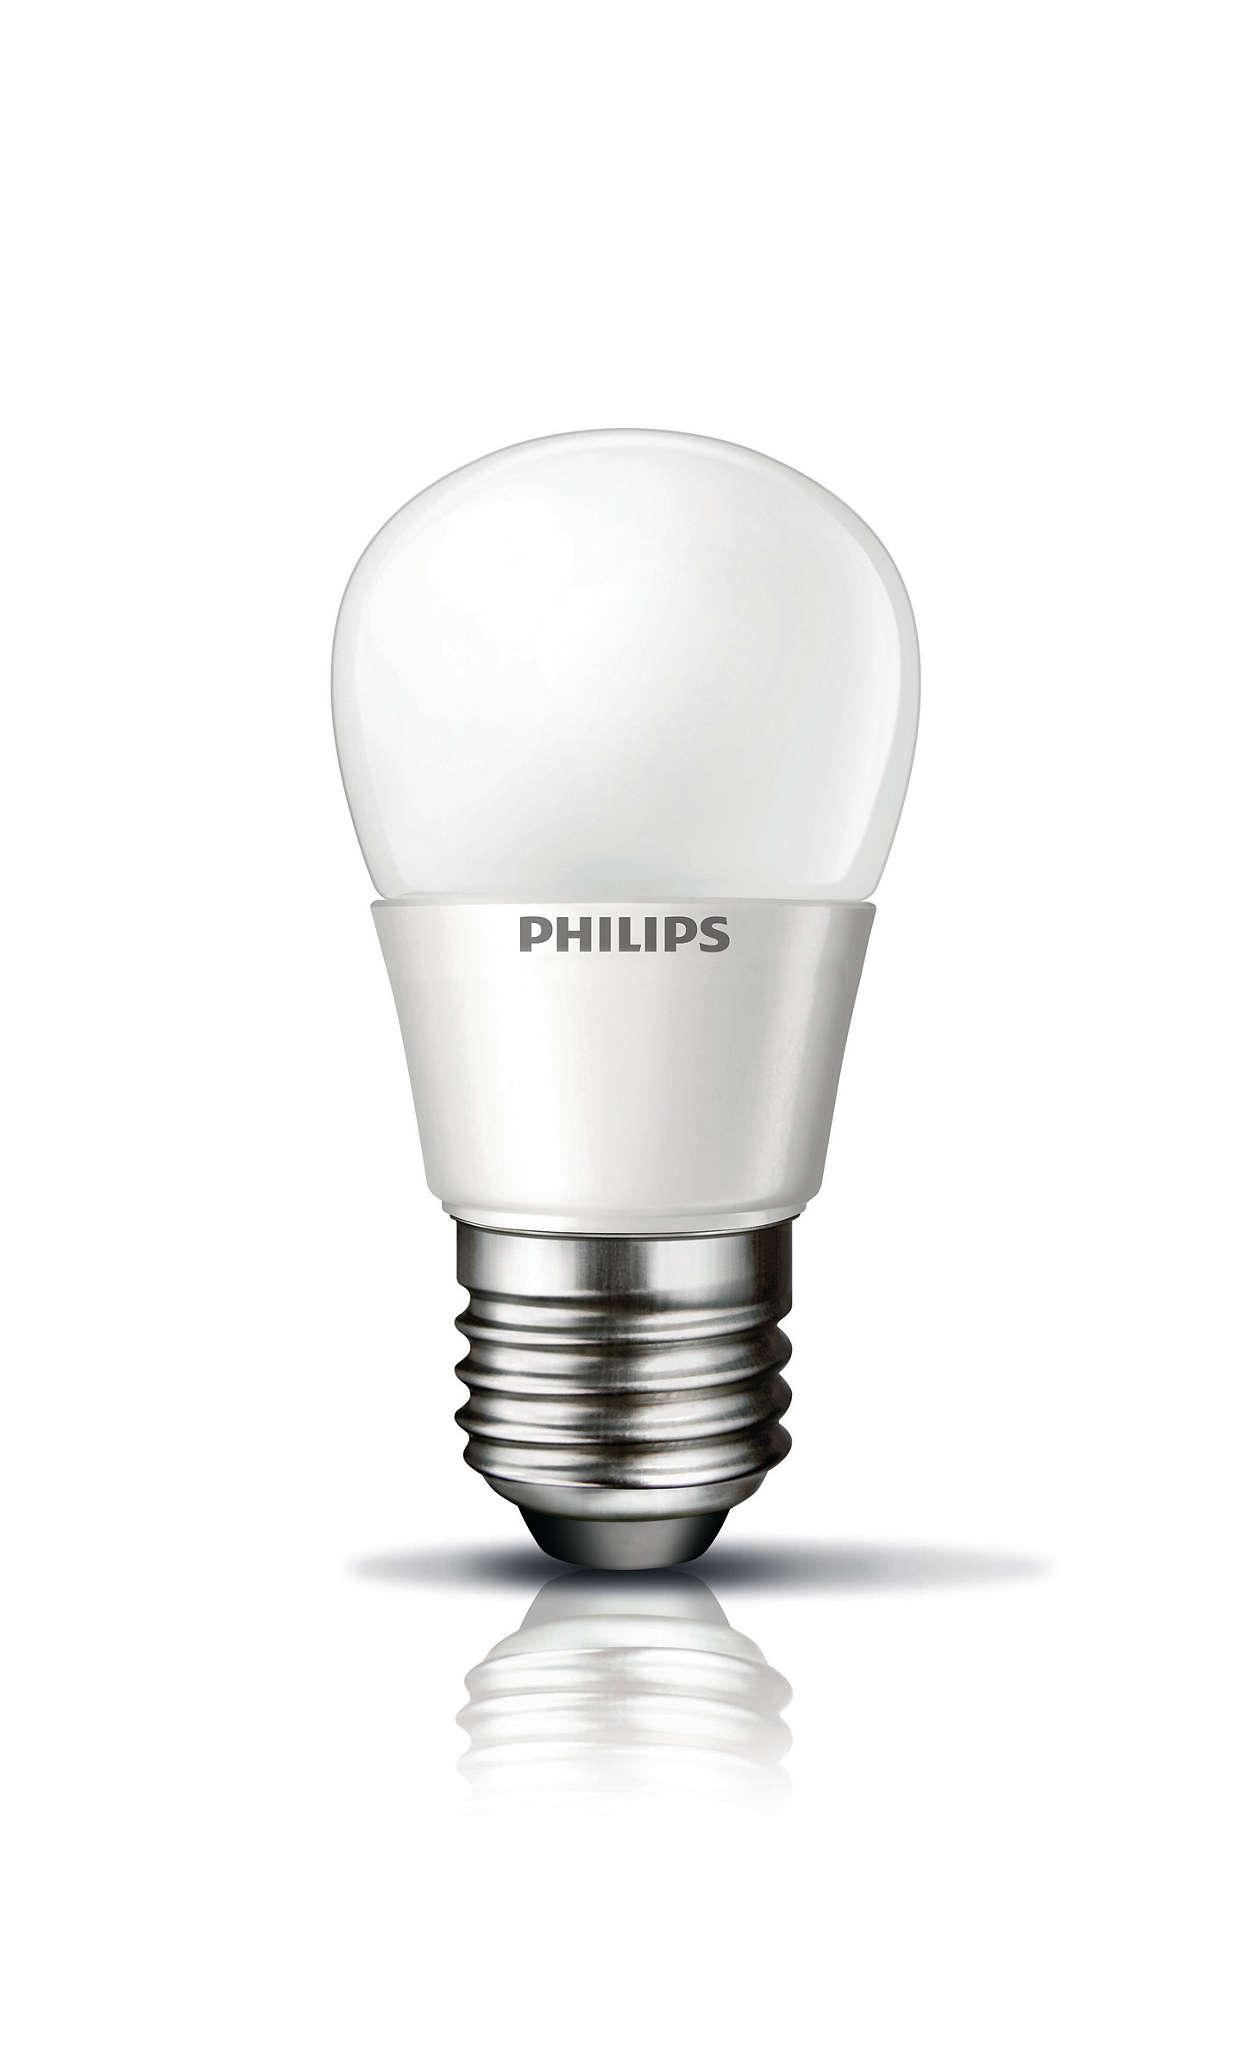 Úspora energie bez kompromisov